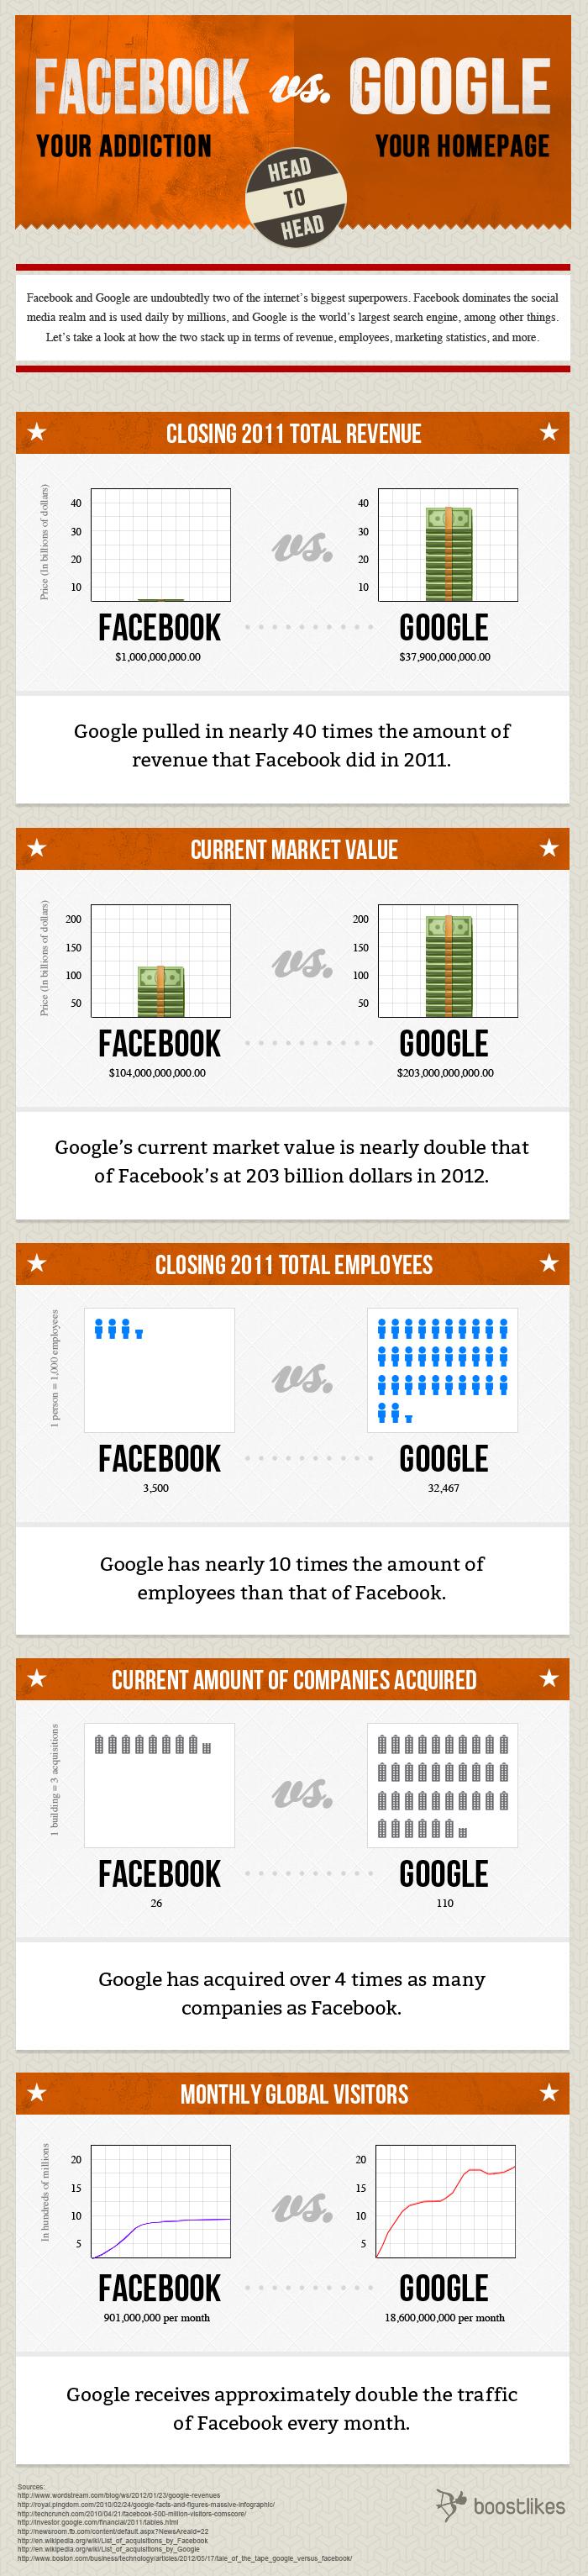 facebook-vs-google 2012